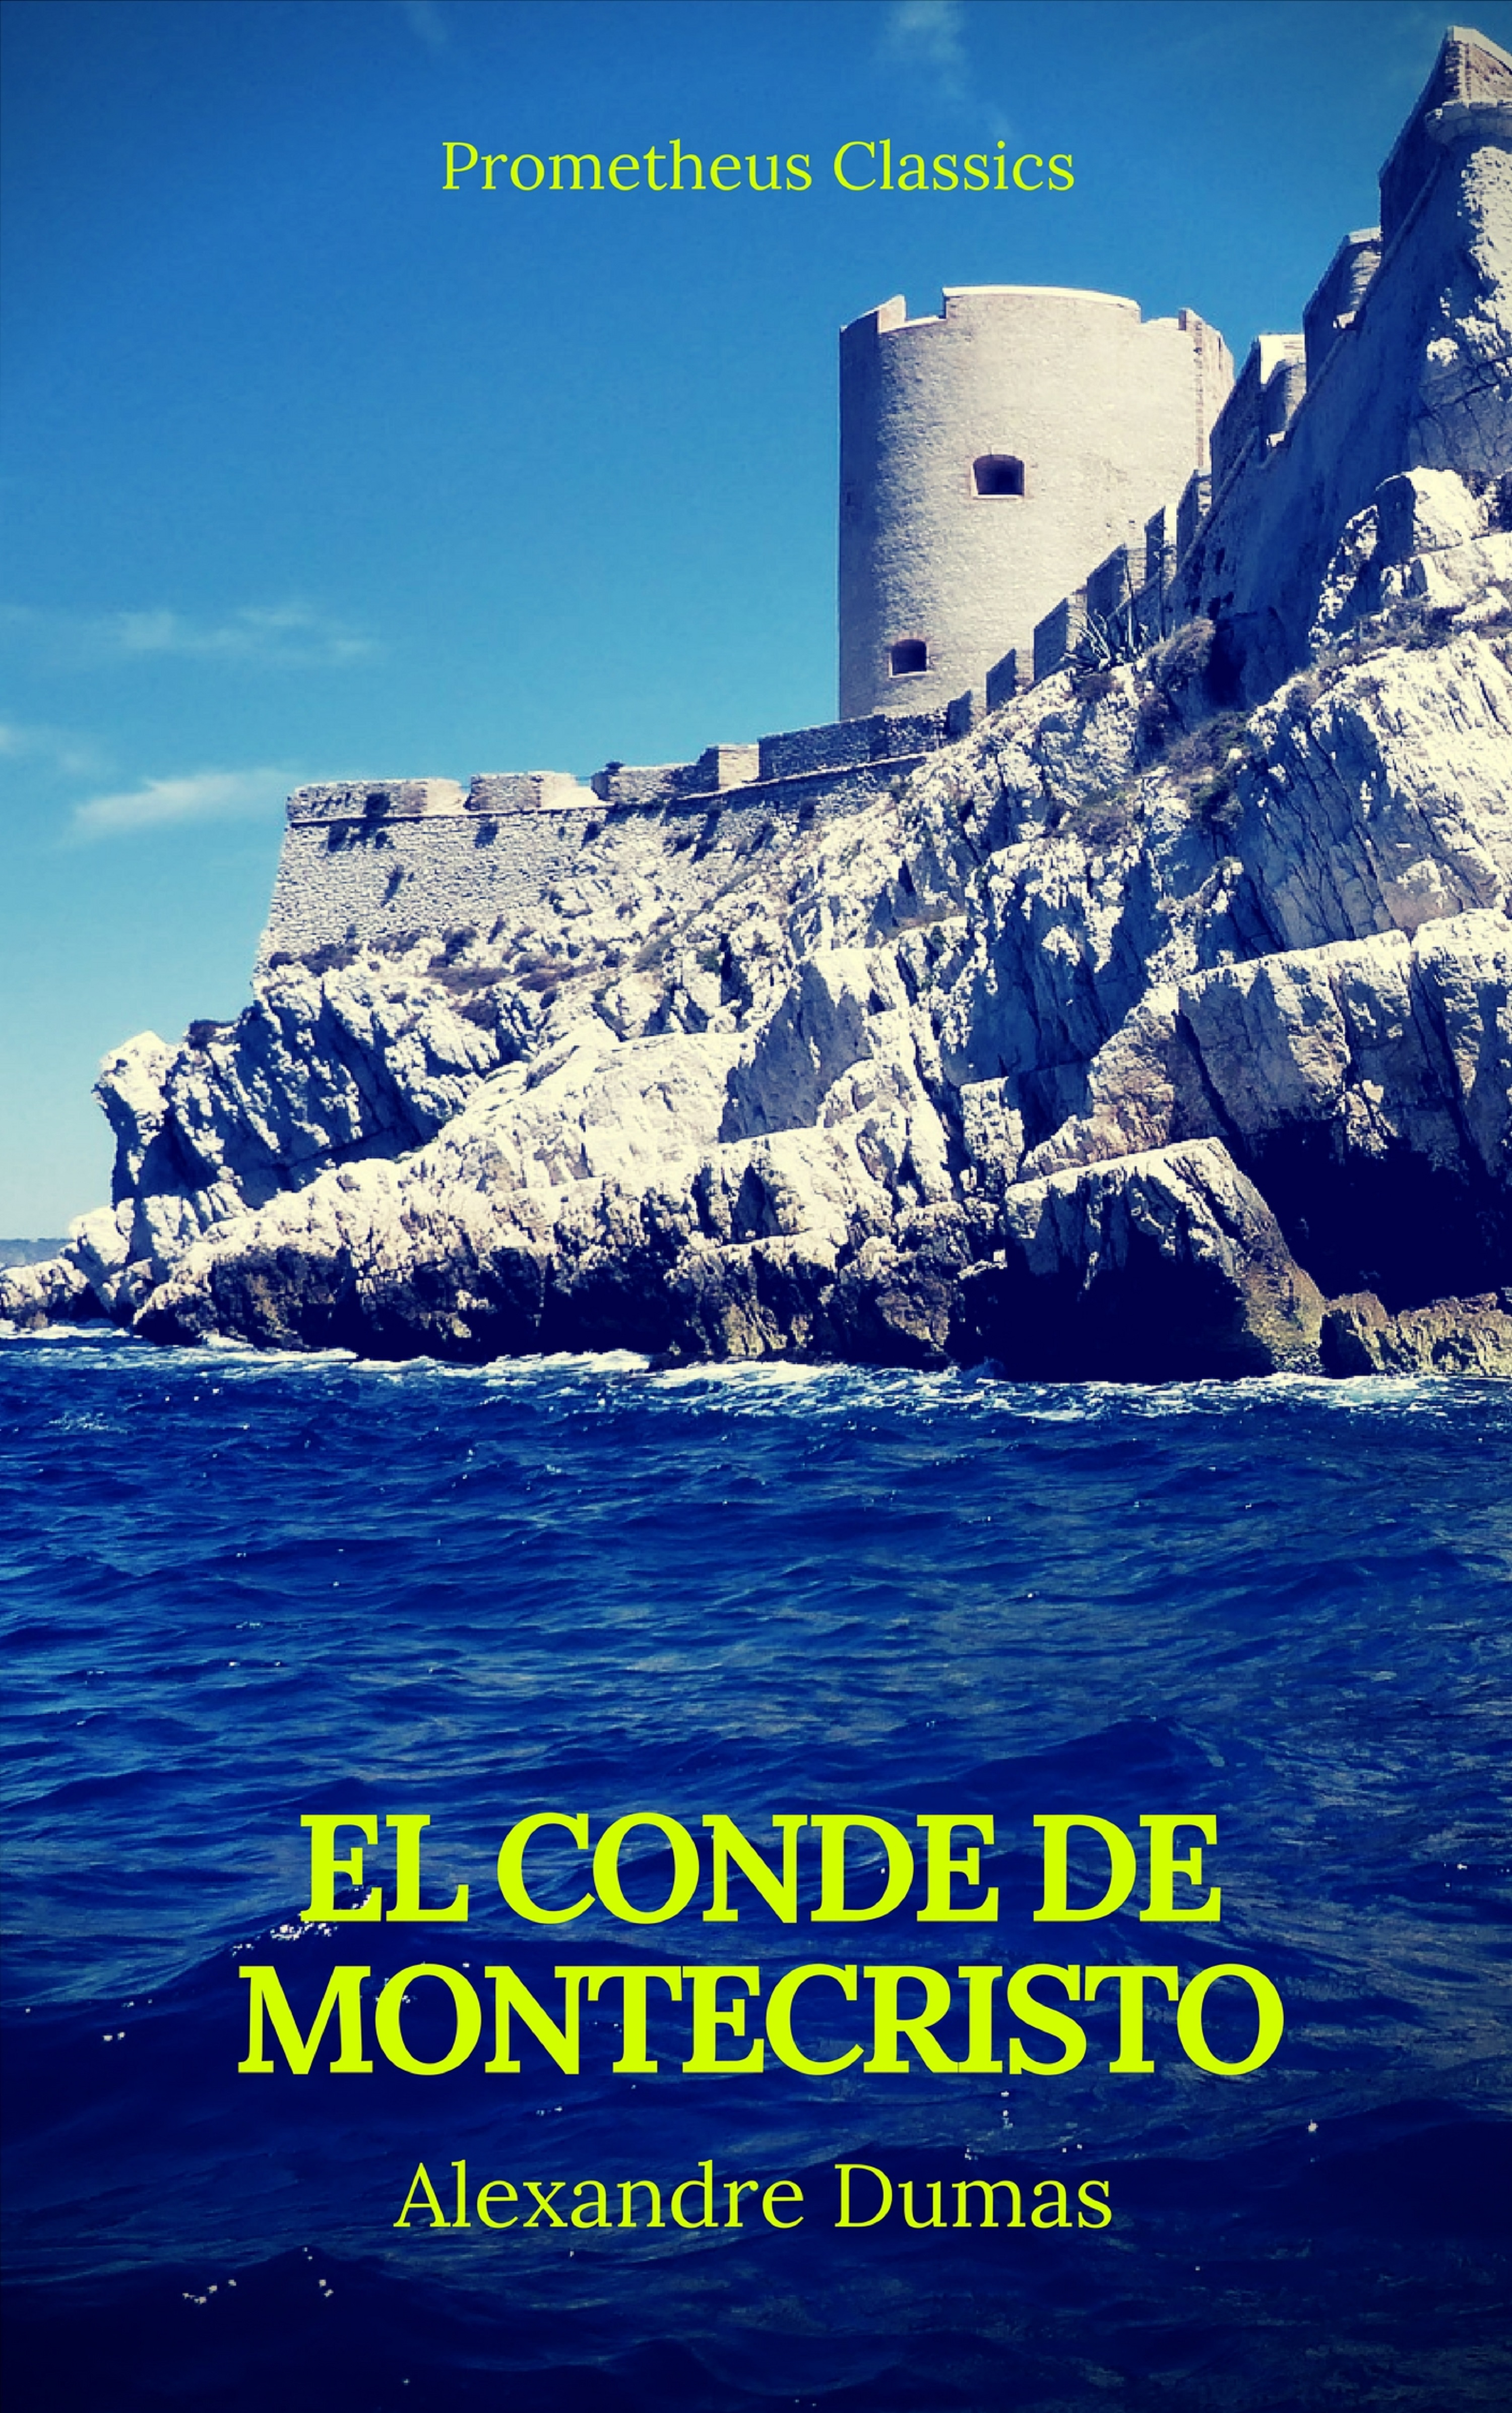 Alexandre Dumas El conde de montecristo (Prometheus Classics)